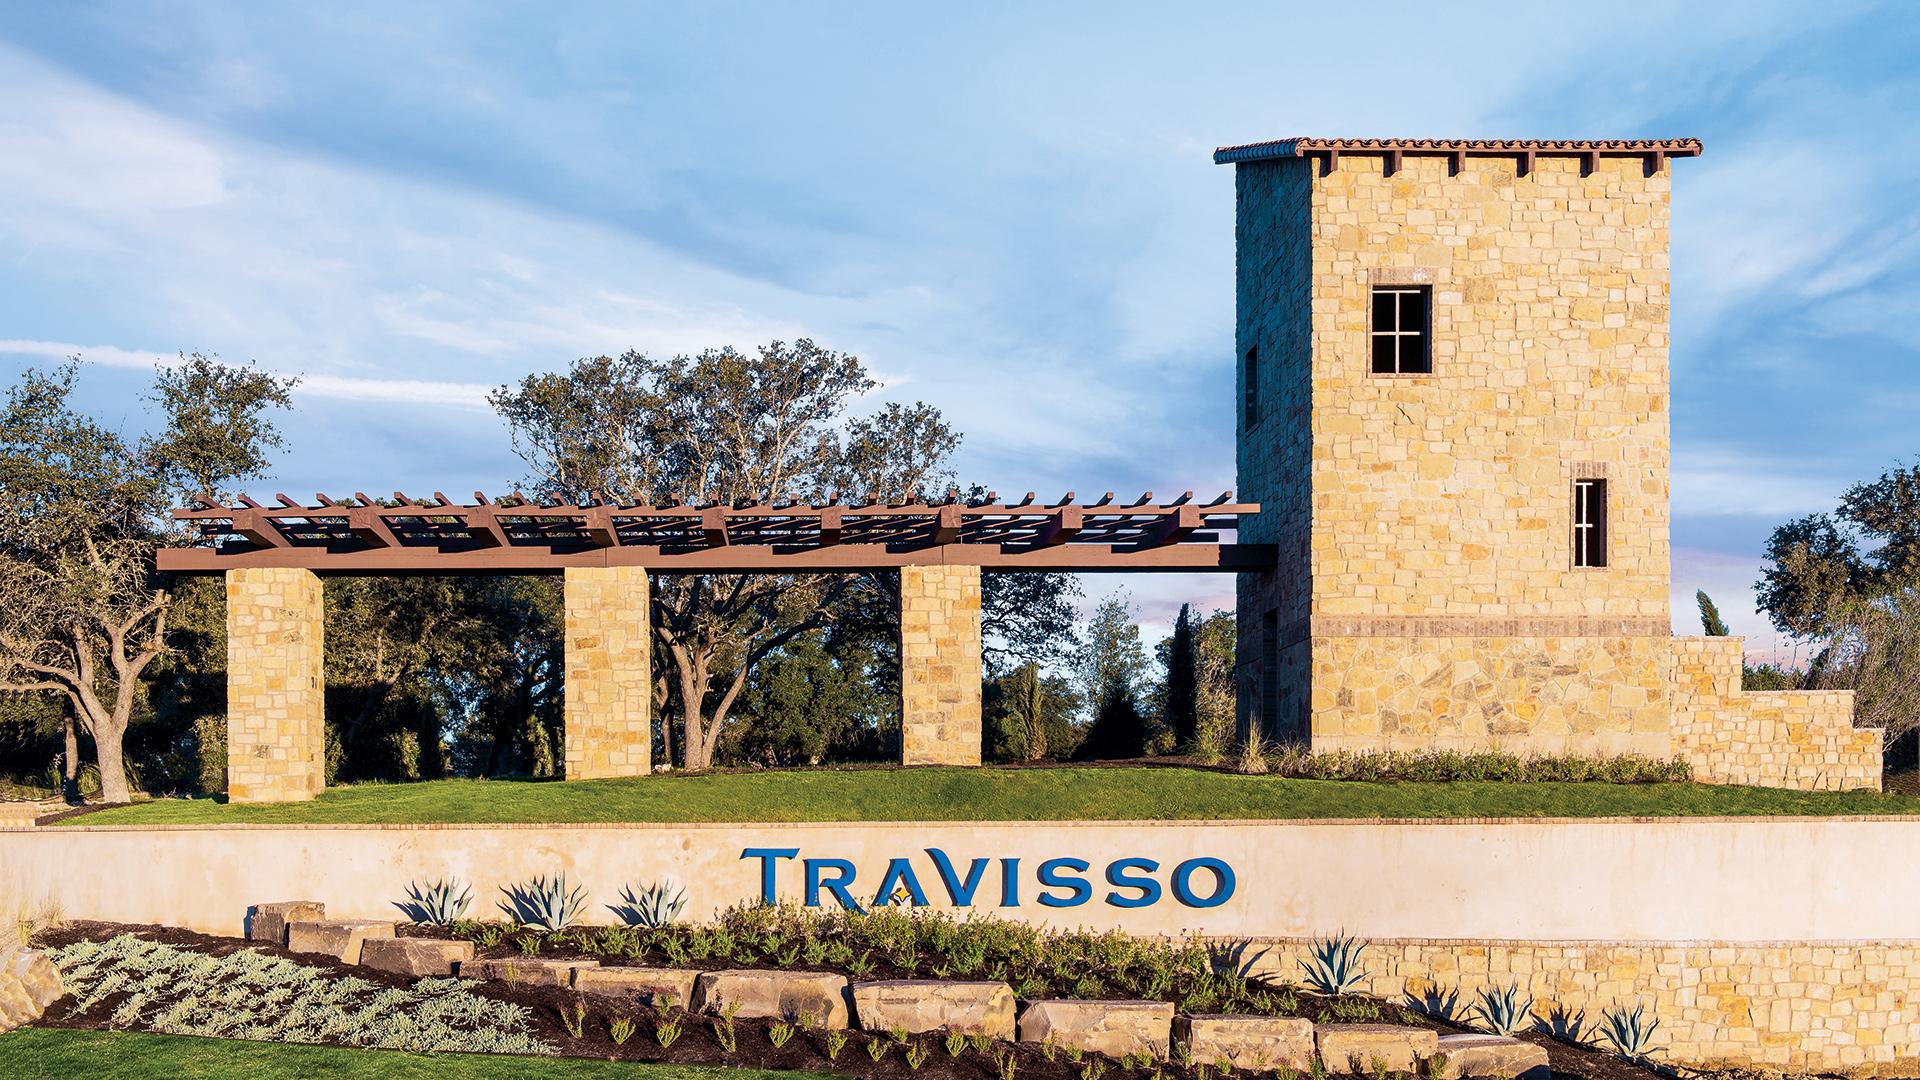 Welcoming Travisso community entrance